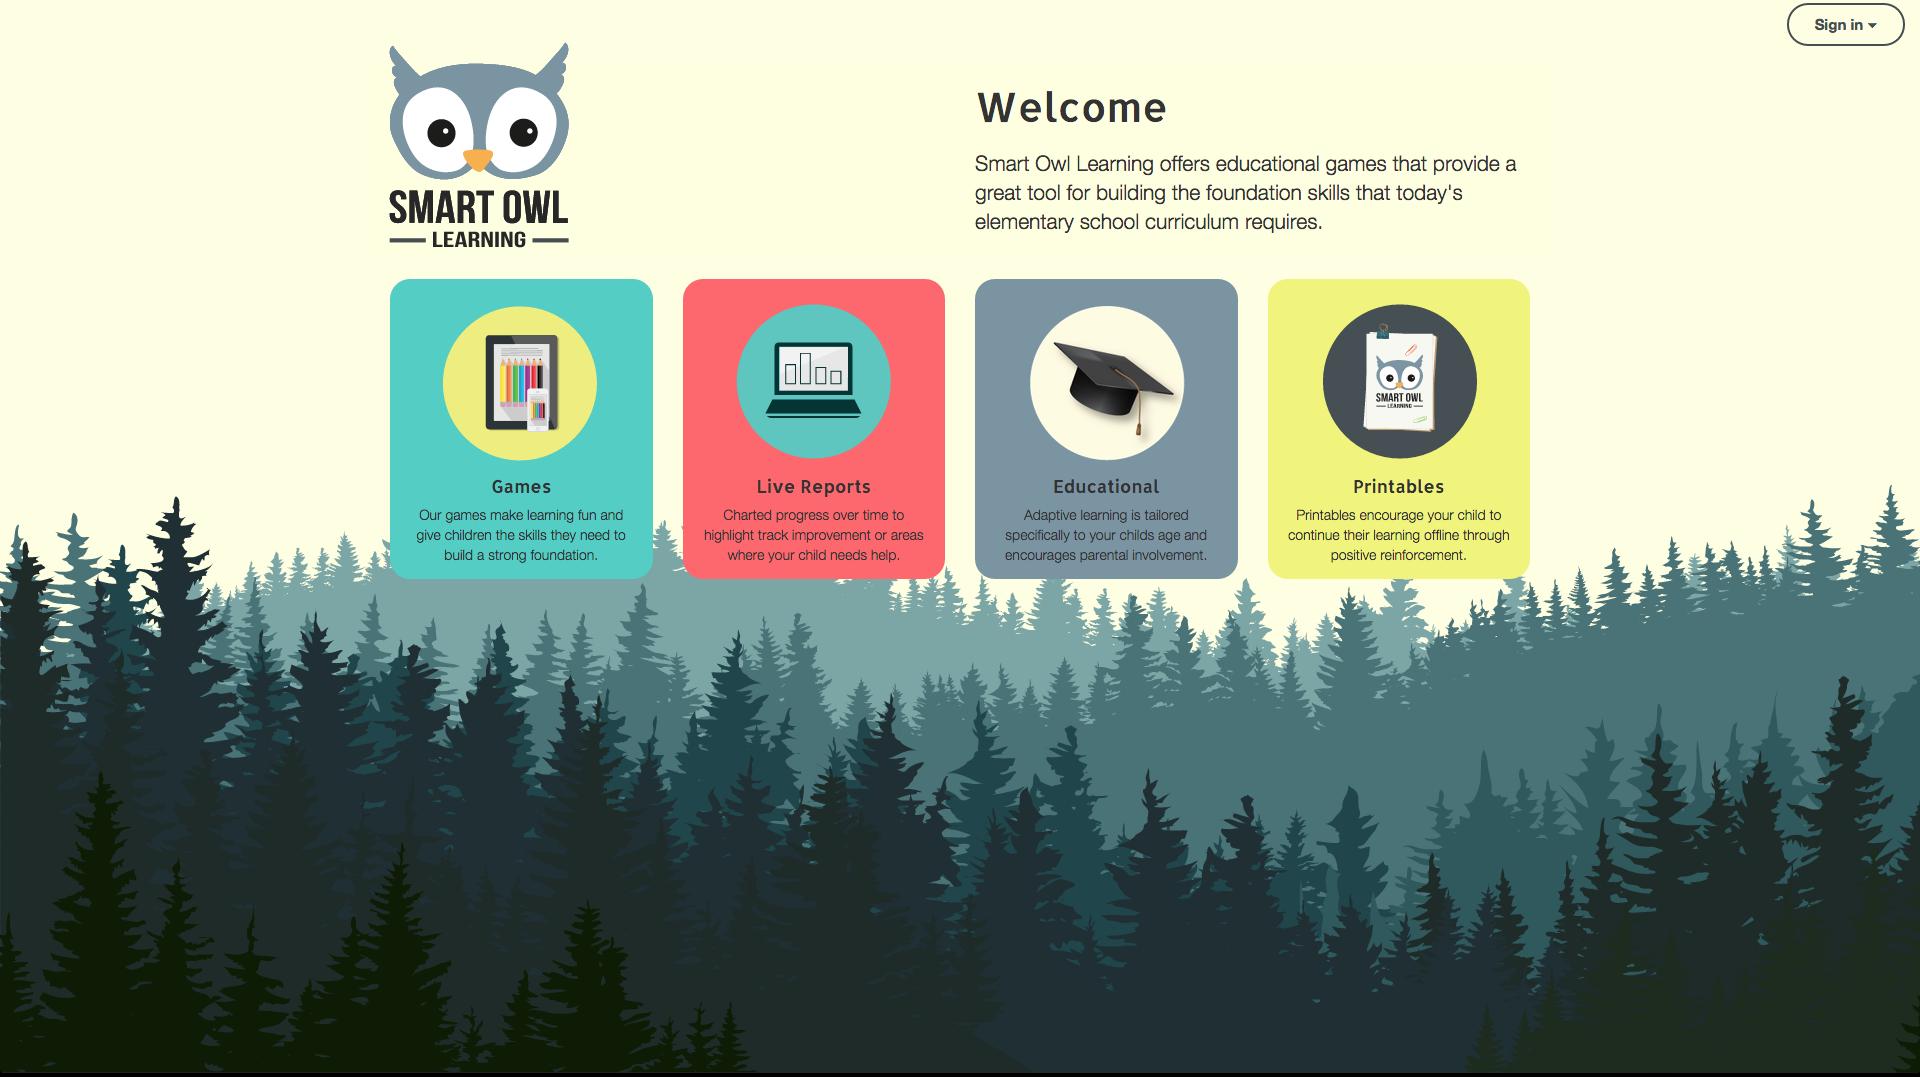 Smart Owl Learning